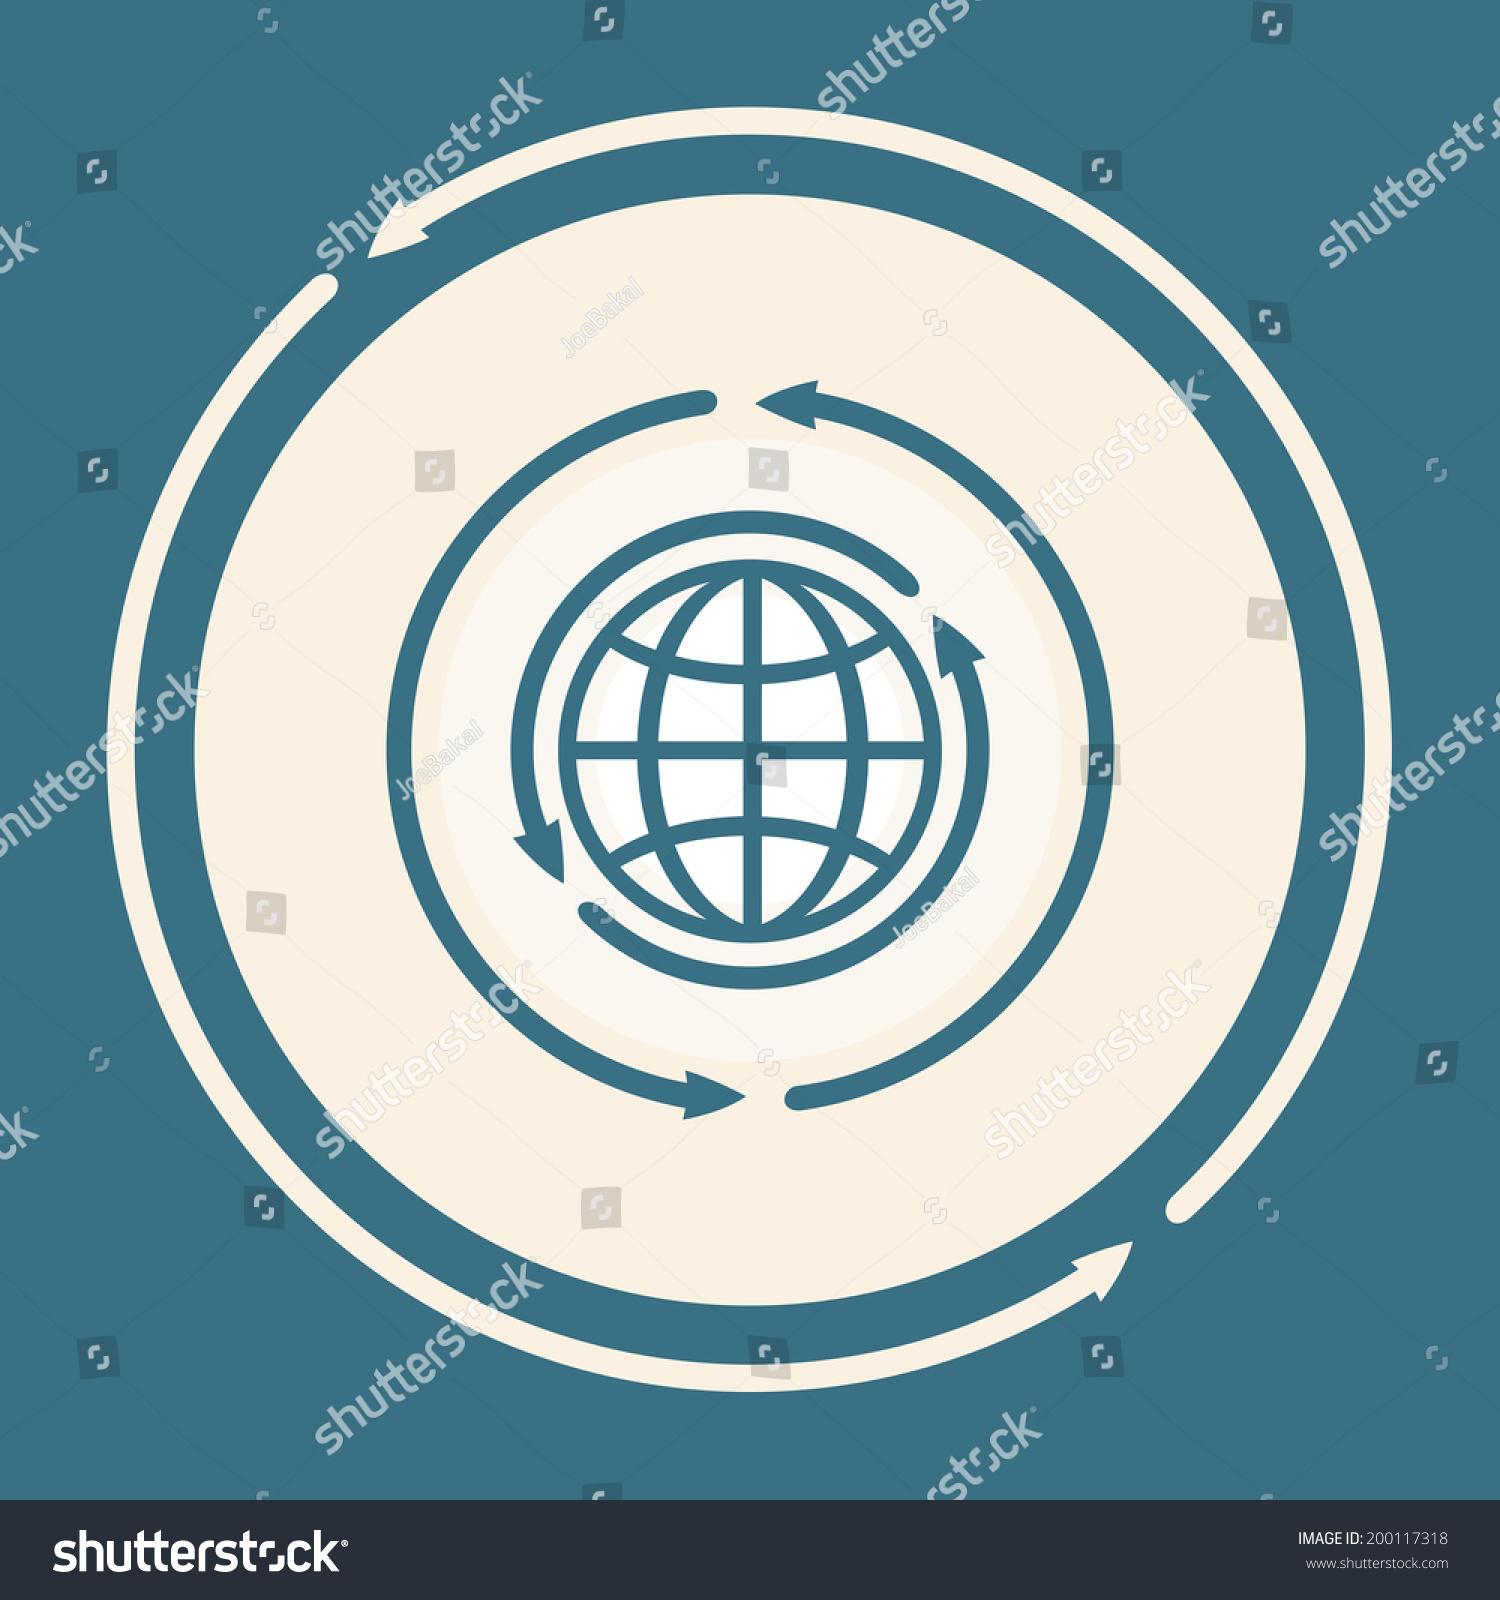 Symbol Renewal World Internet Projects Stock Illustration 200117318